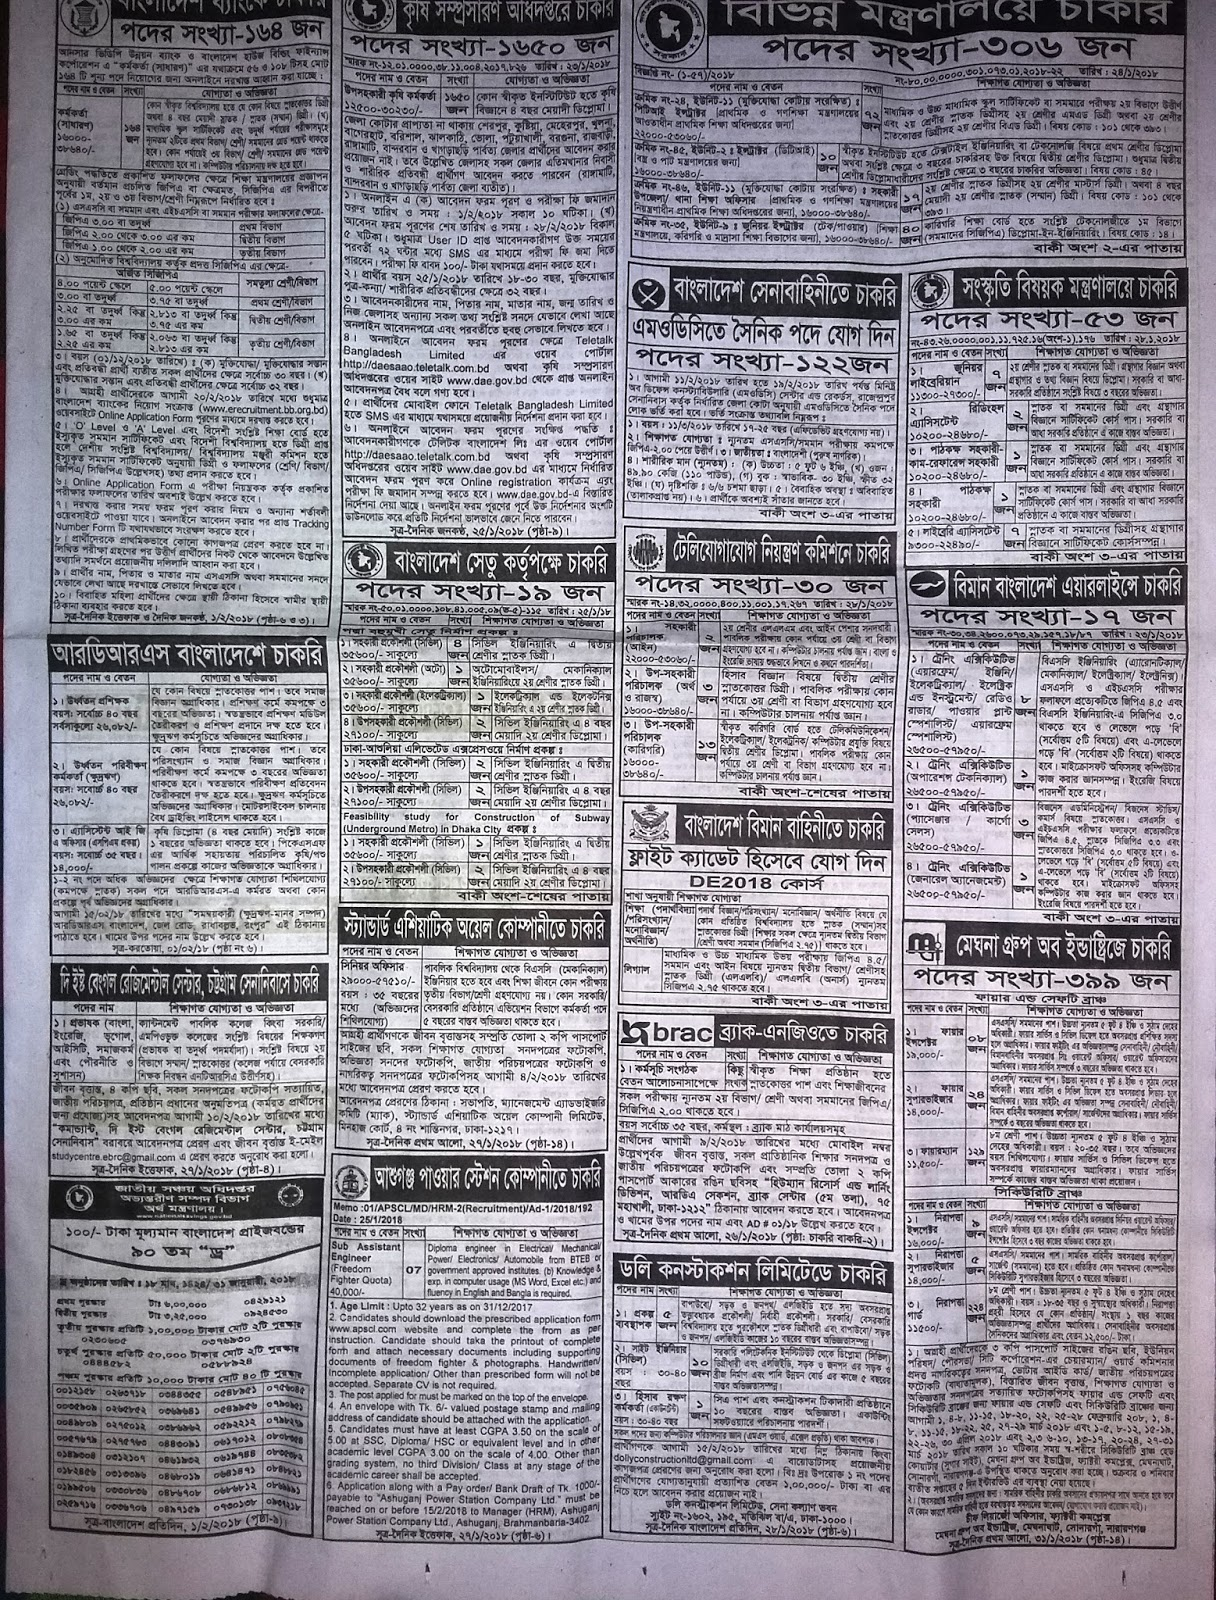 BD Job newspaper February 2018 - Chakrir Khobor চাকরির